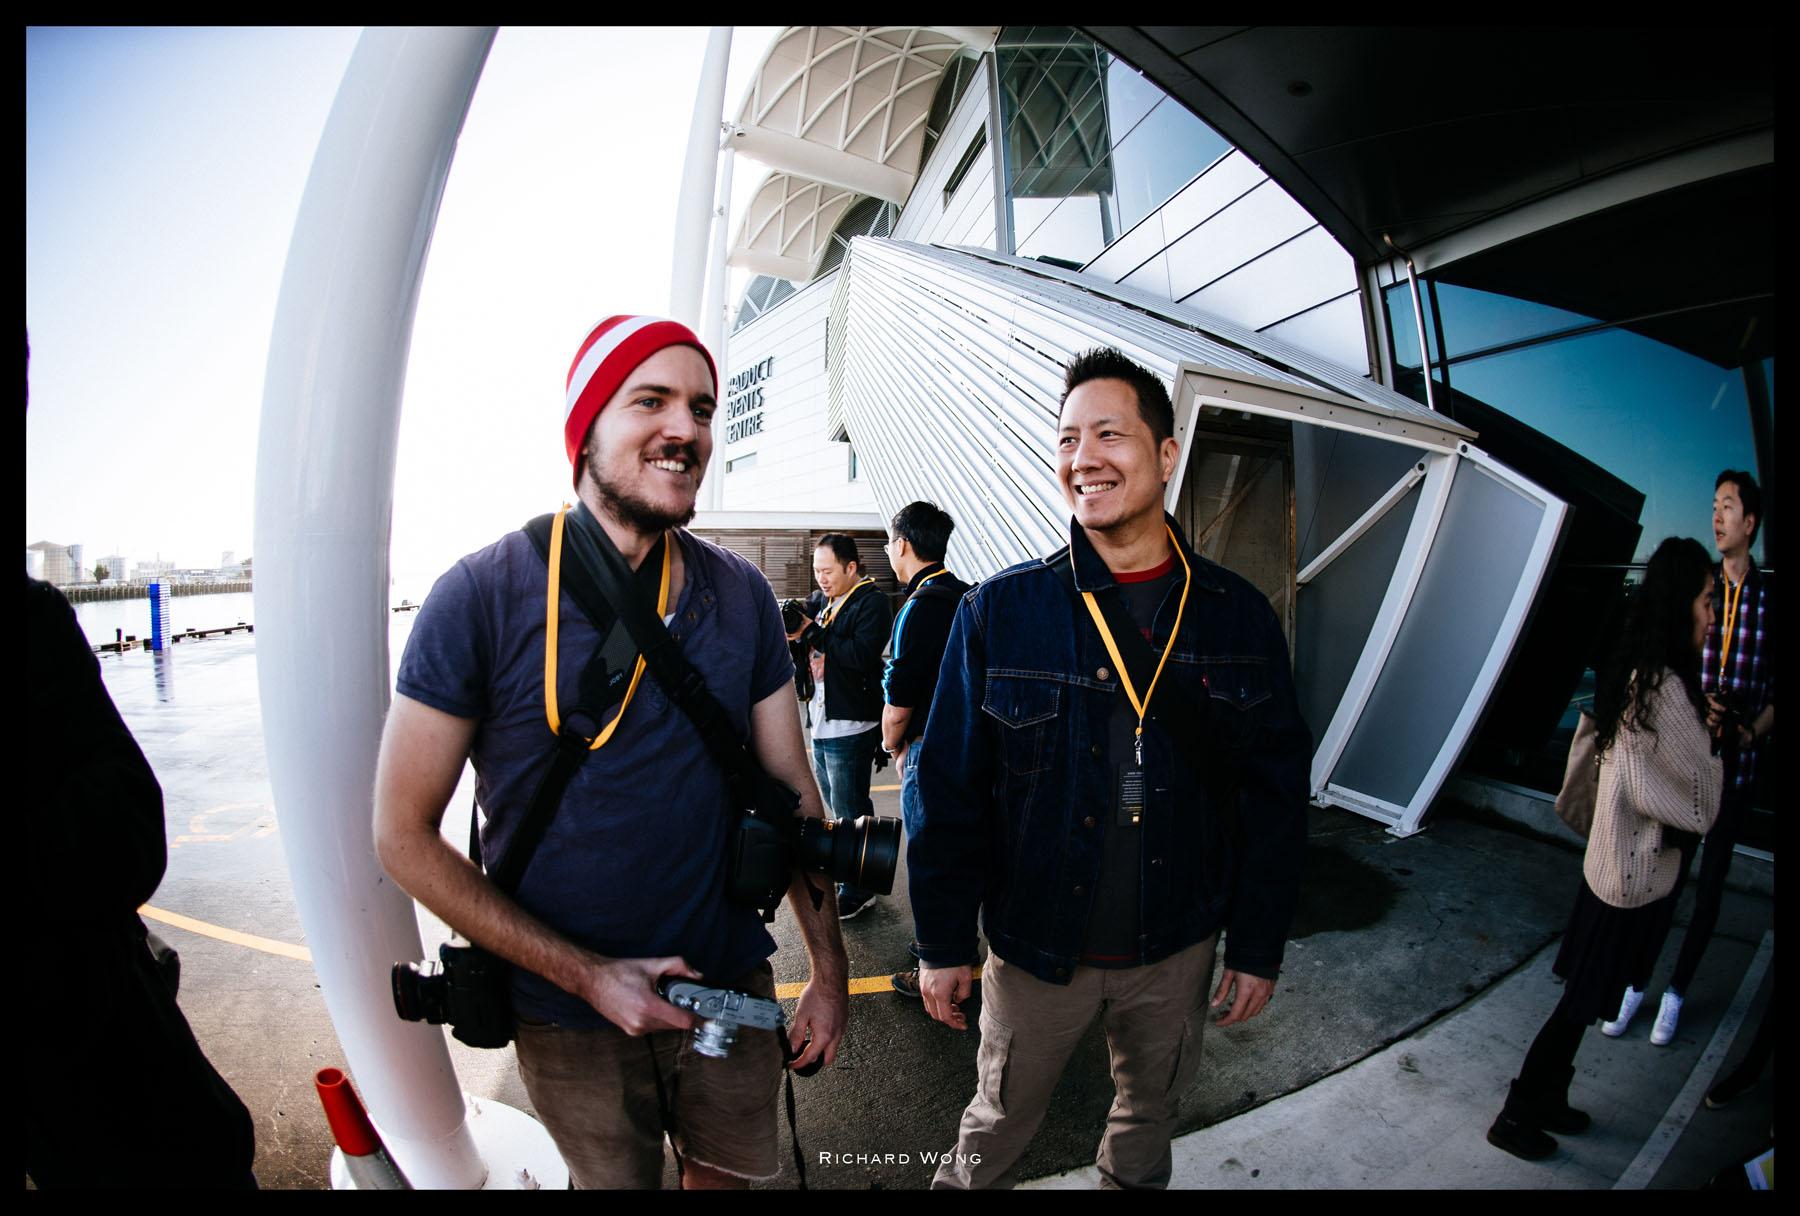 Nikon-Auckland-Photo-Day-2016-08